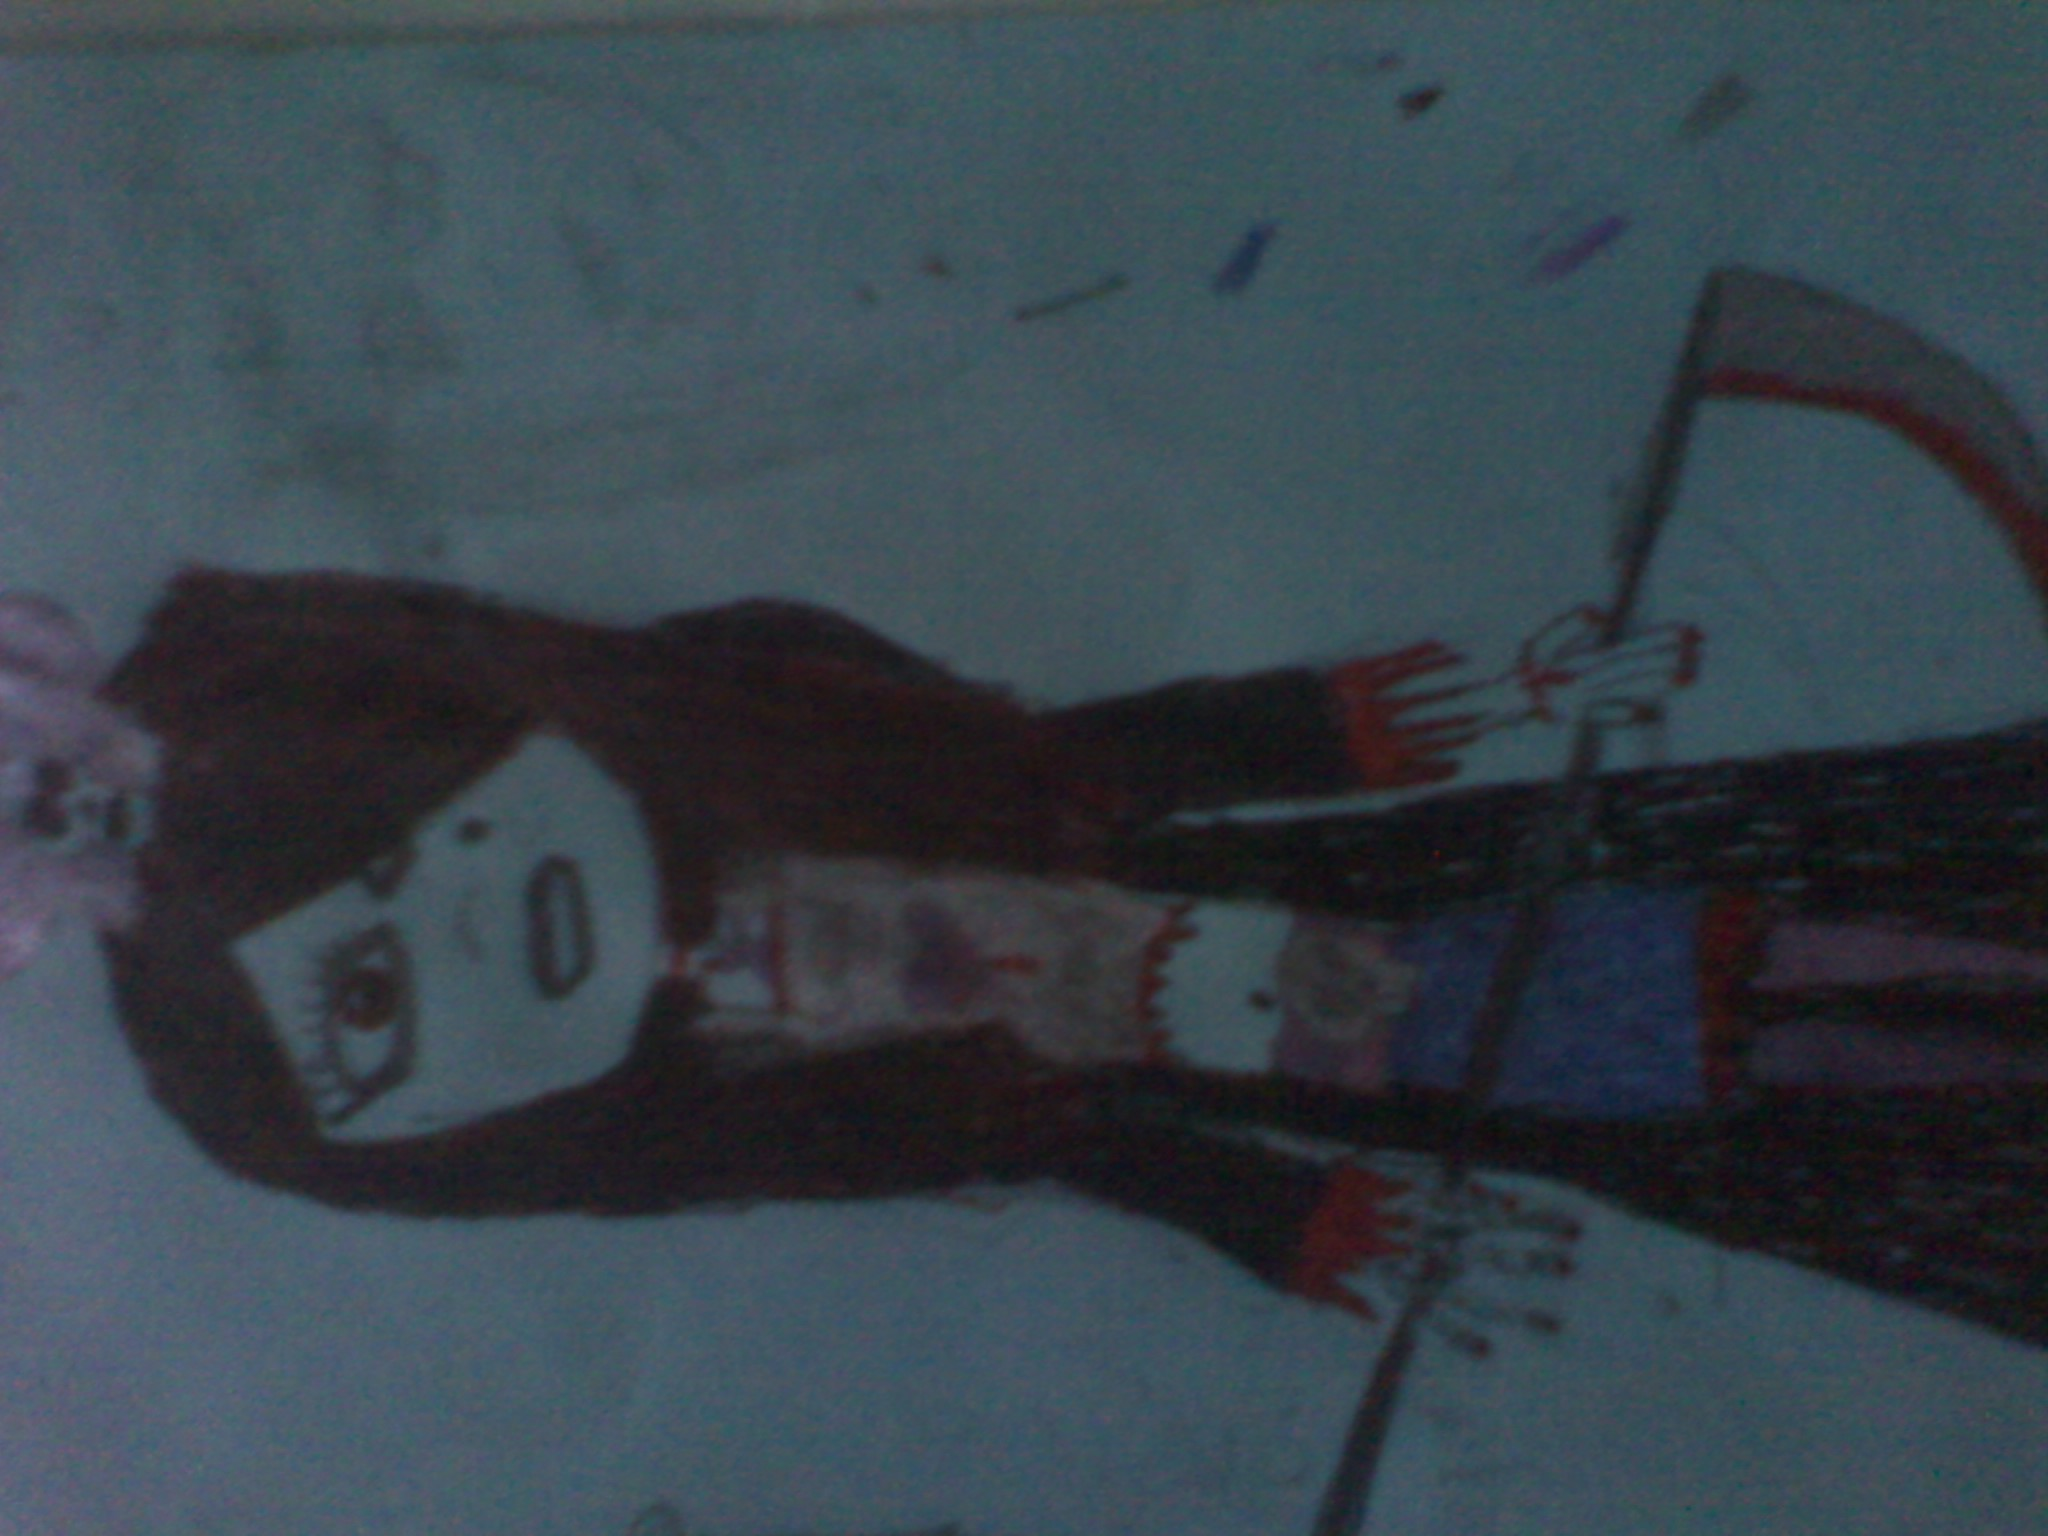 Meet my character Grimmie Reaper, daughter of the grim reaper